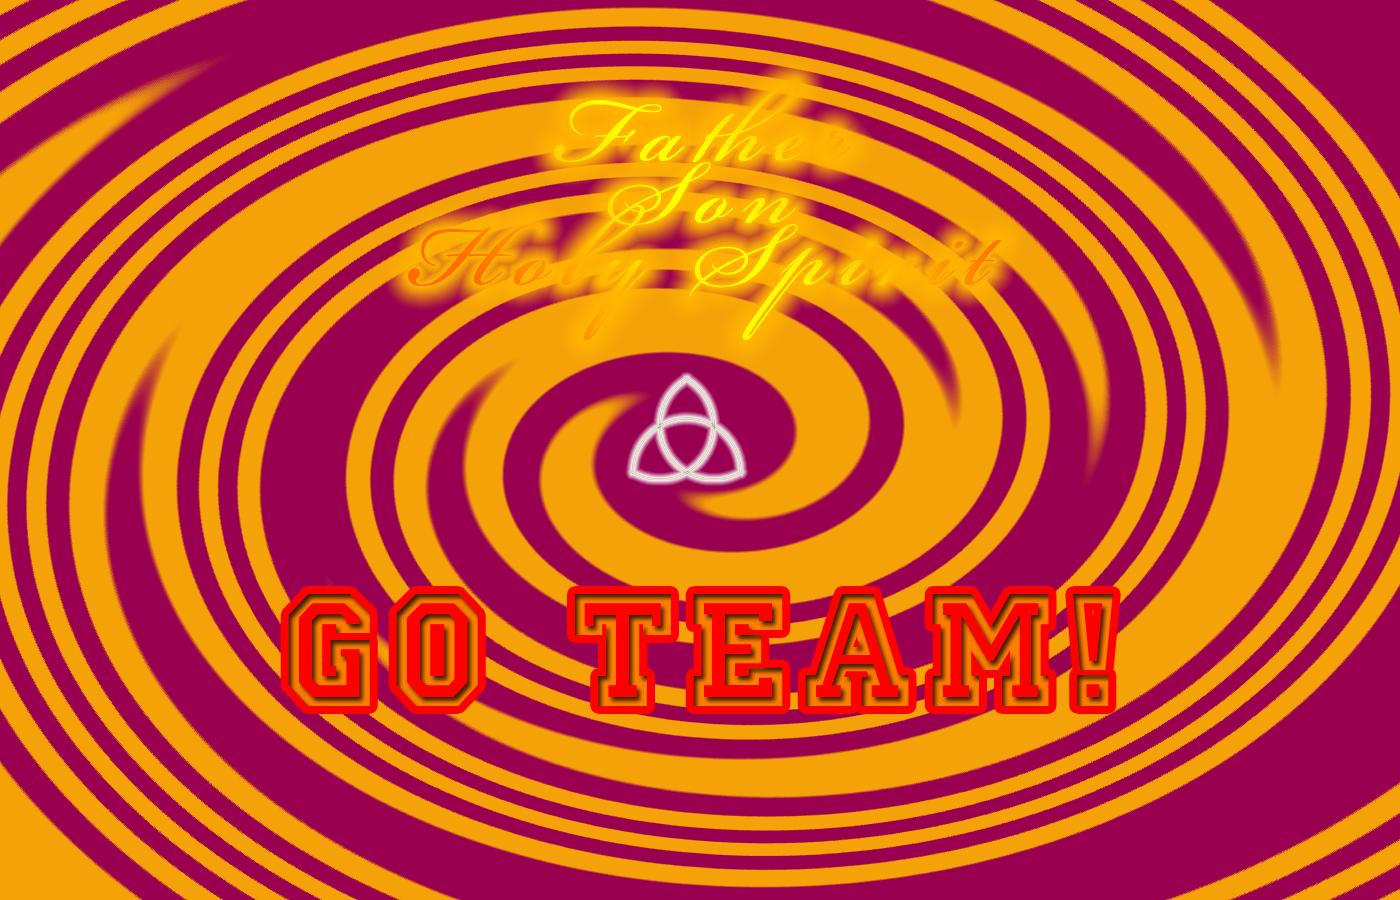 Go Team by Linkz57